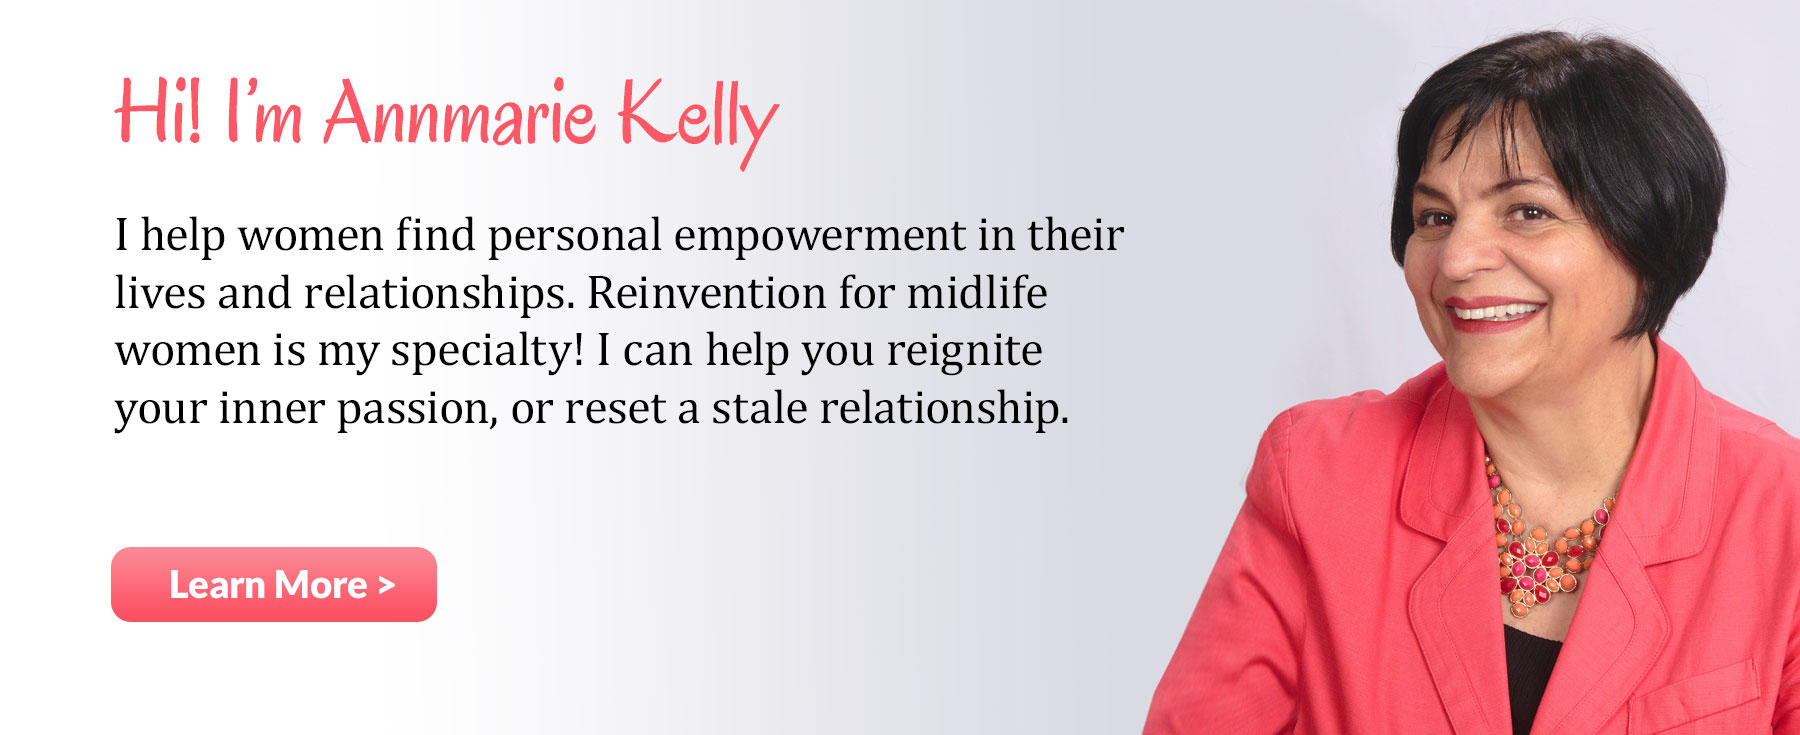 Annmarie Kelly, womens empowerment leader